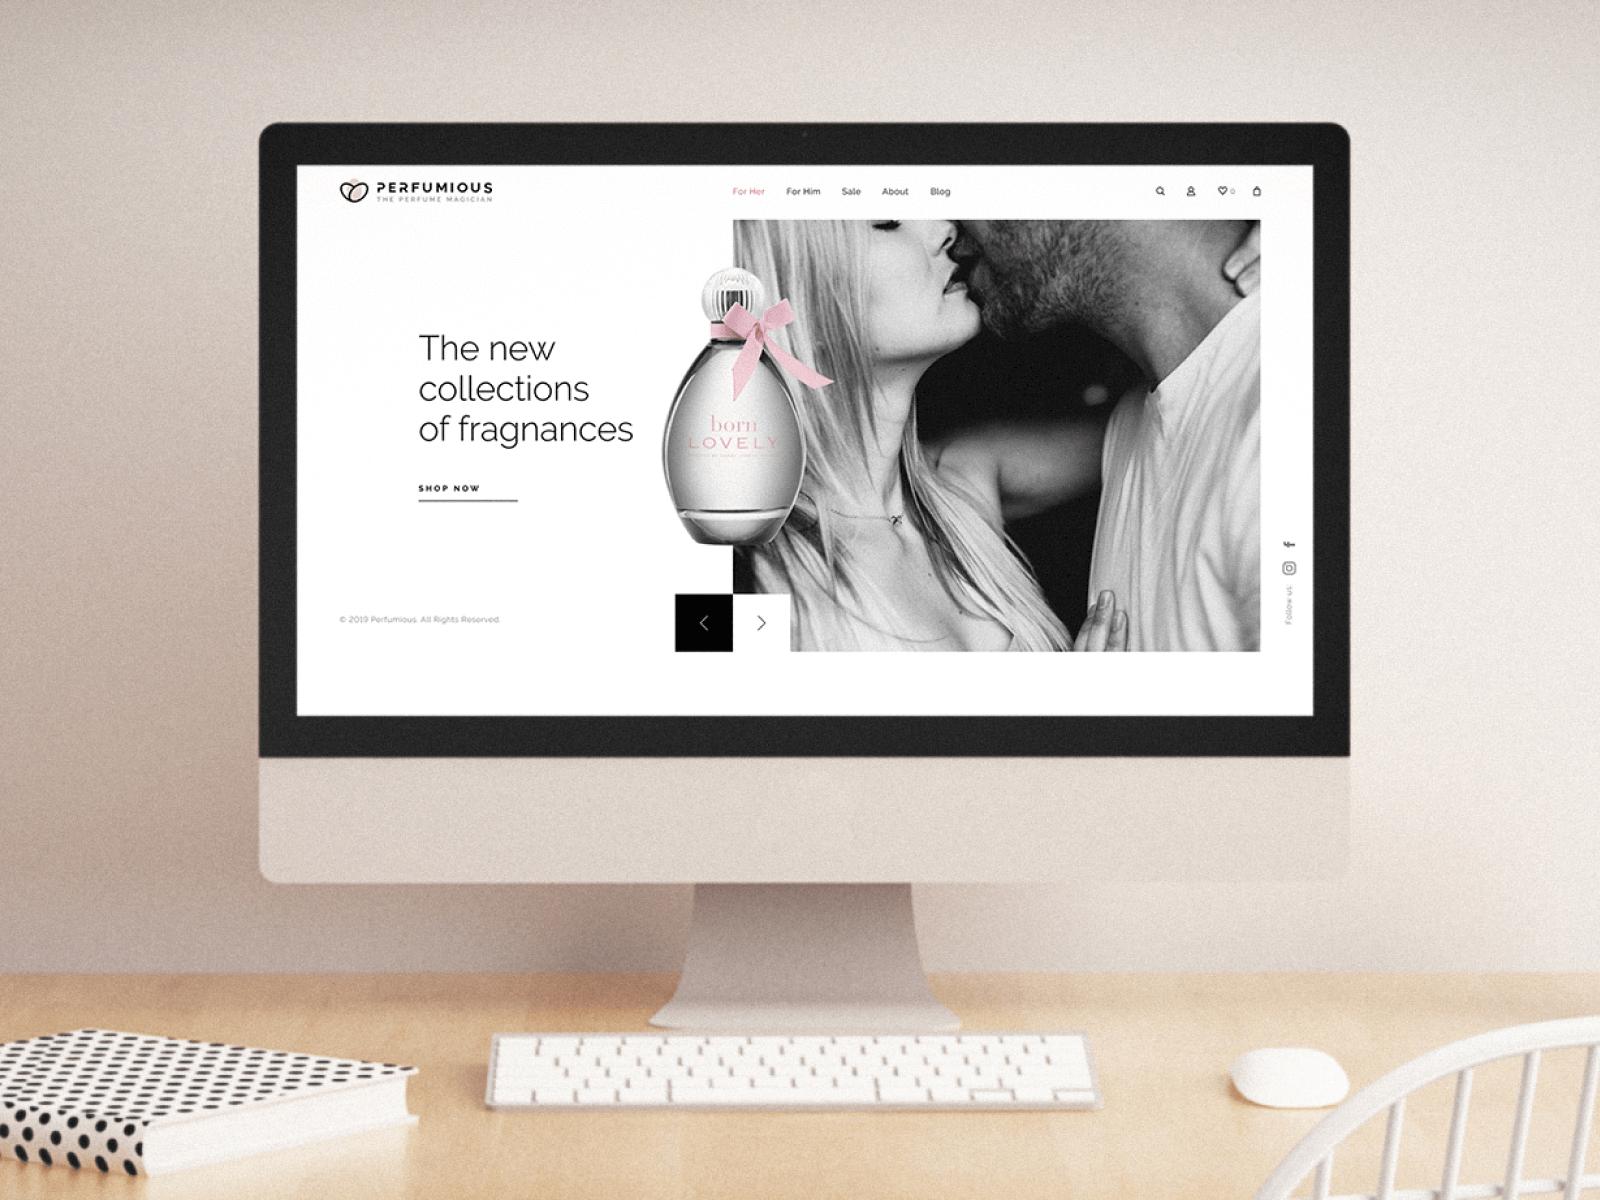 Perfumious Web Page Design